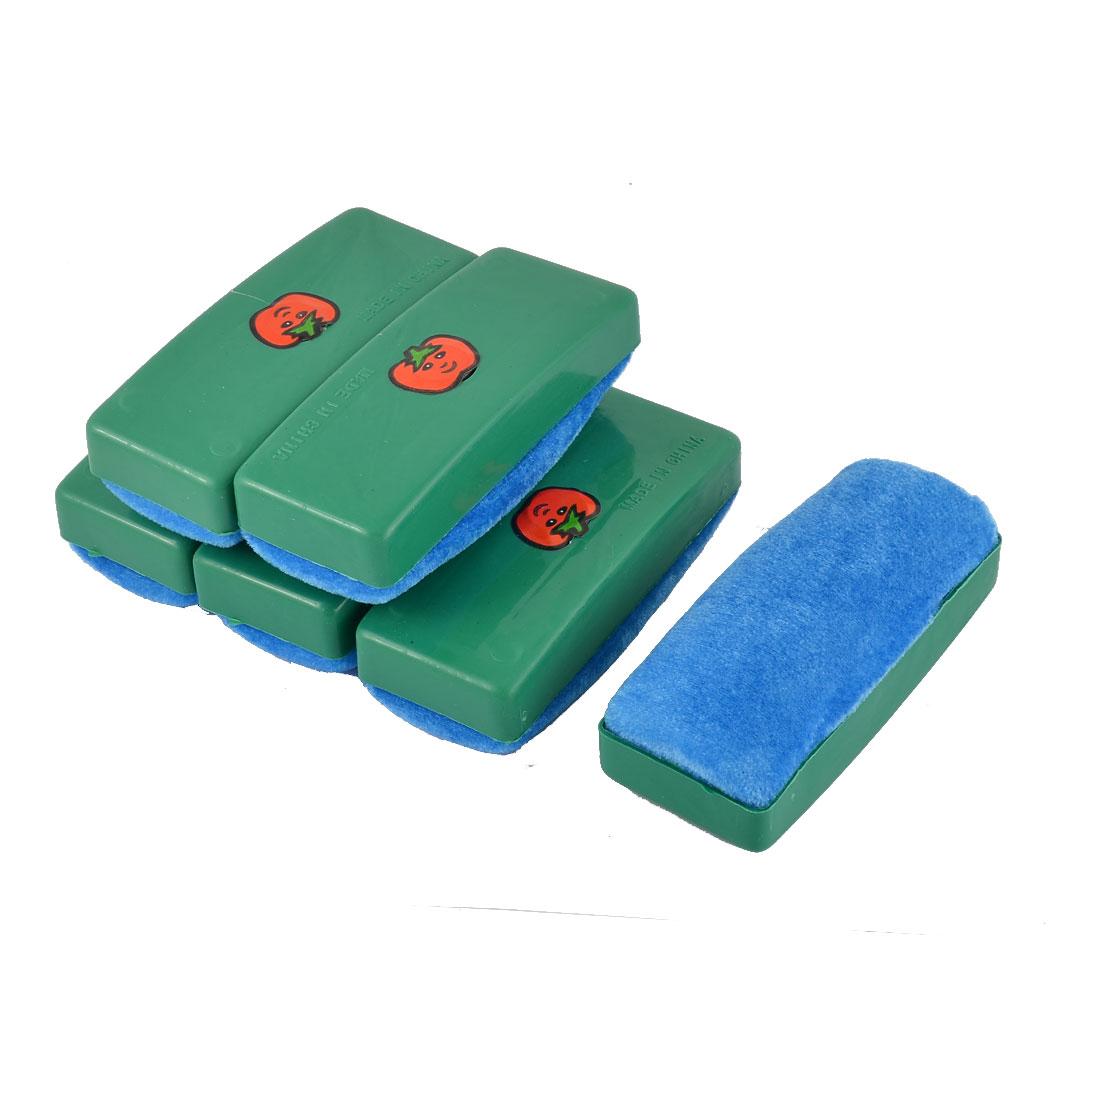 School Teaching Blackboard Plastic Shell Eraser Cleaner Blue Green 6 PCS